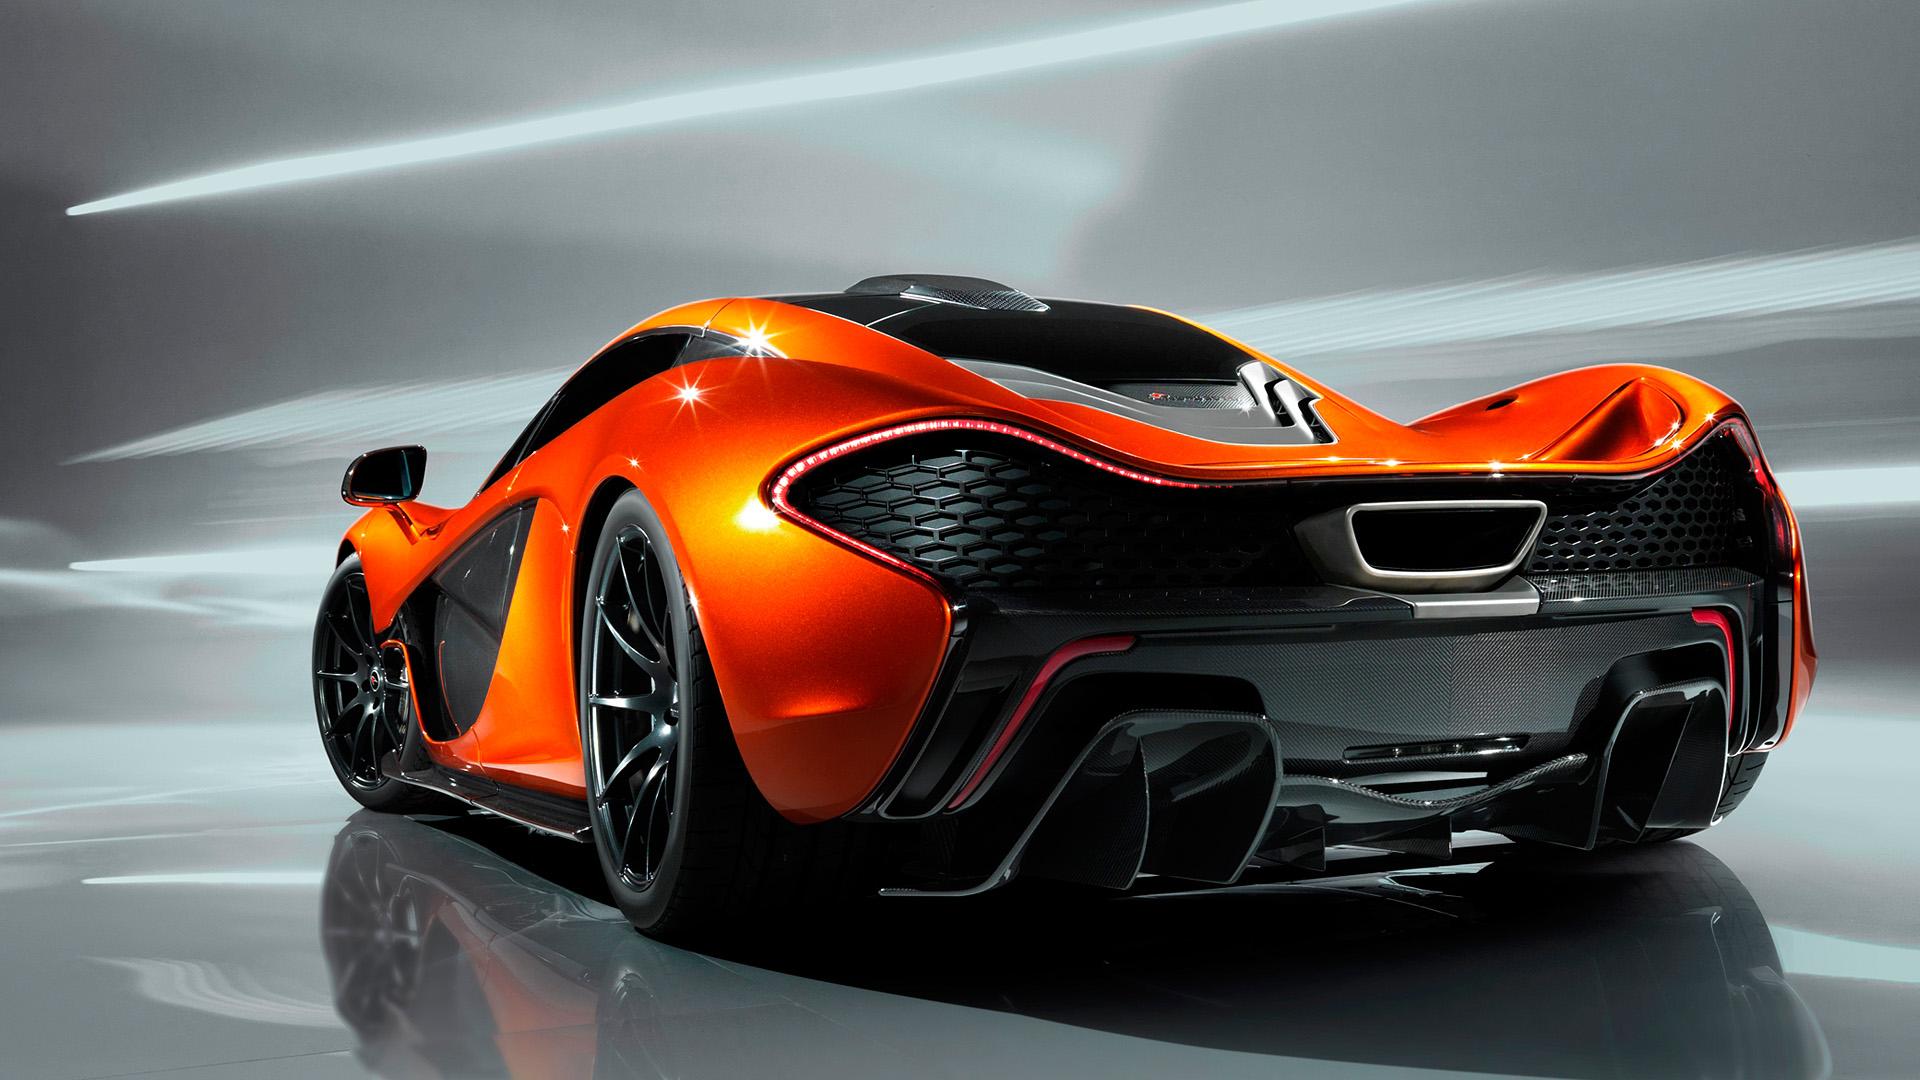 46+ McLaren HD Wallpaper on WallpaperSafari